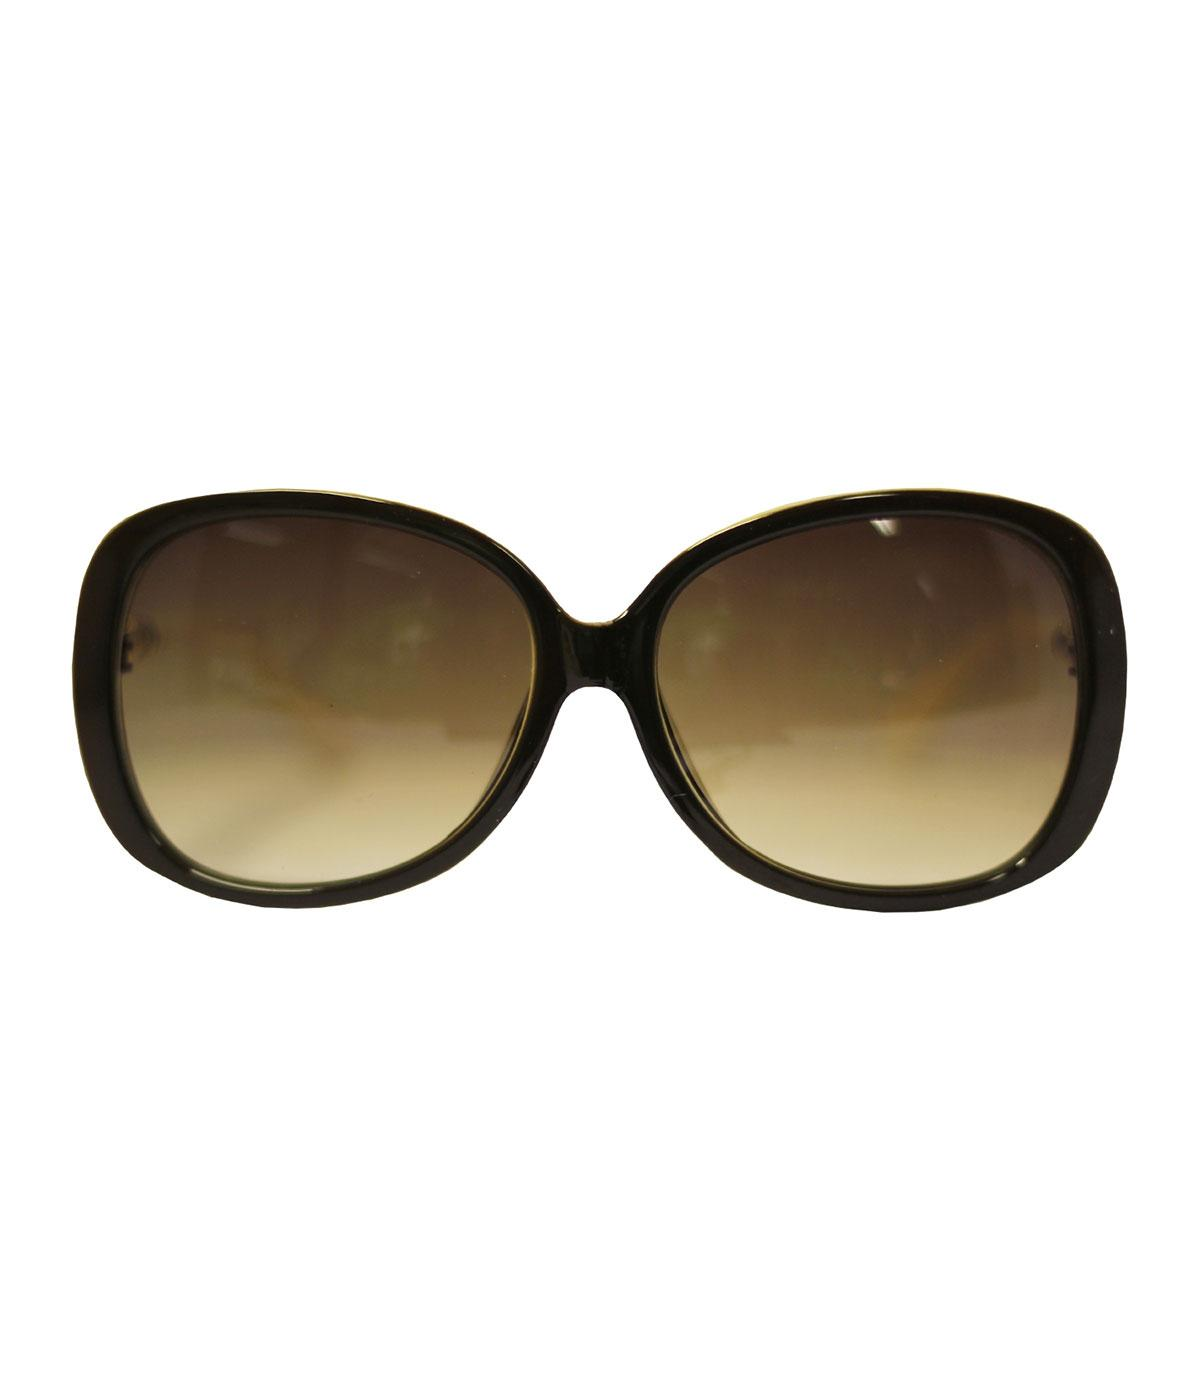 Solene COLLECTIF Vintage 60s Catseye Sunglasses